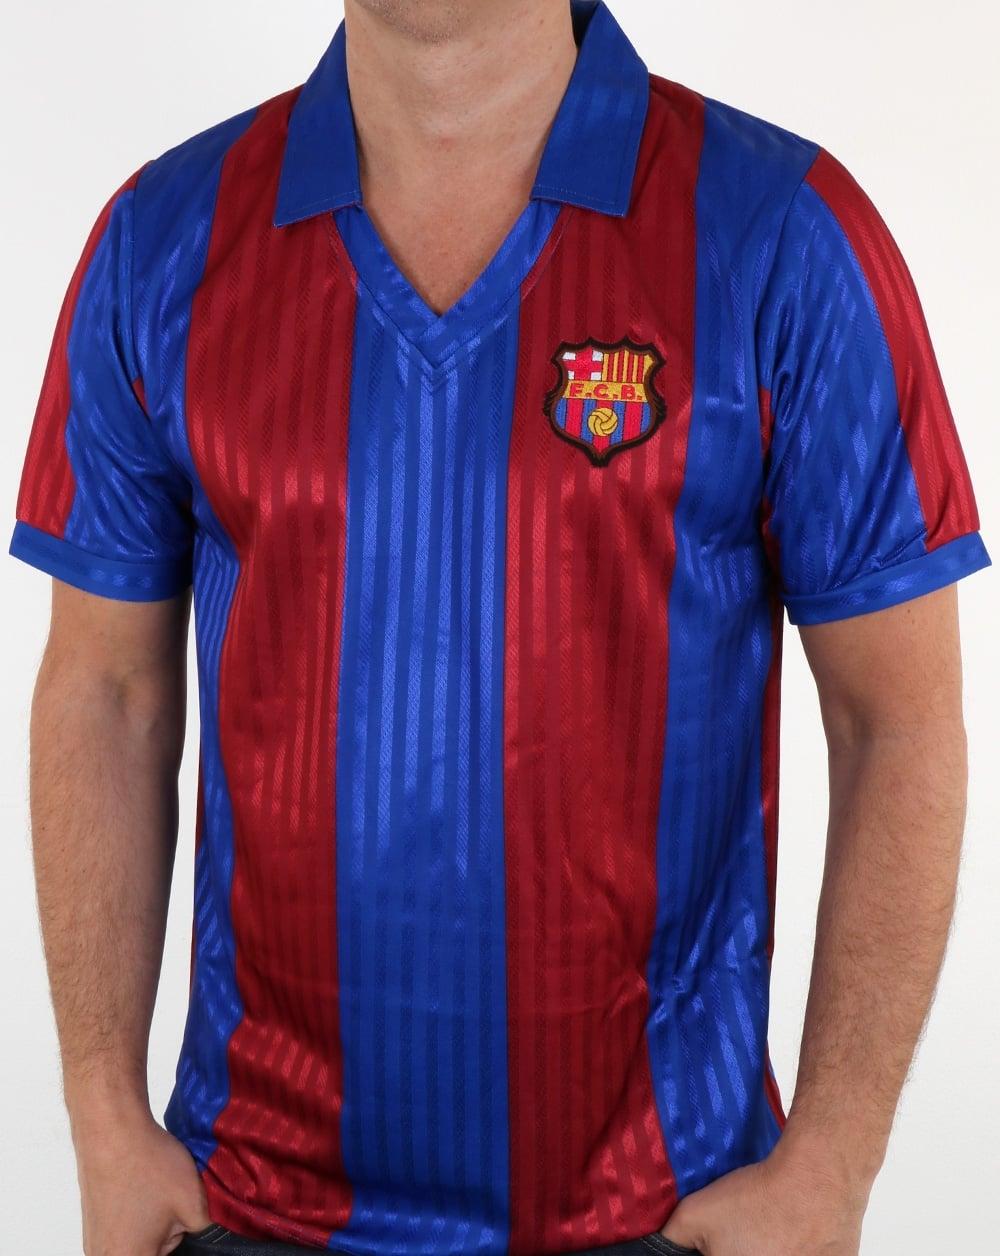 bc8bb7b897c 80s Casual Classics 80s Casual Classics Barcelona 1992 Retro Football Shirt  Red Blue